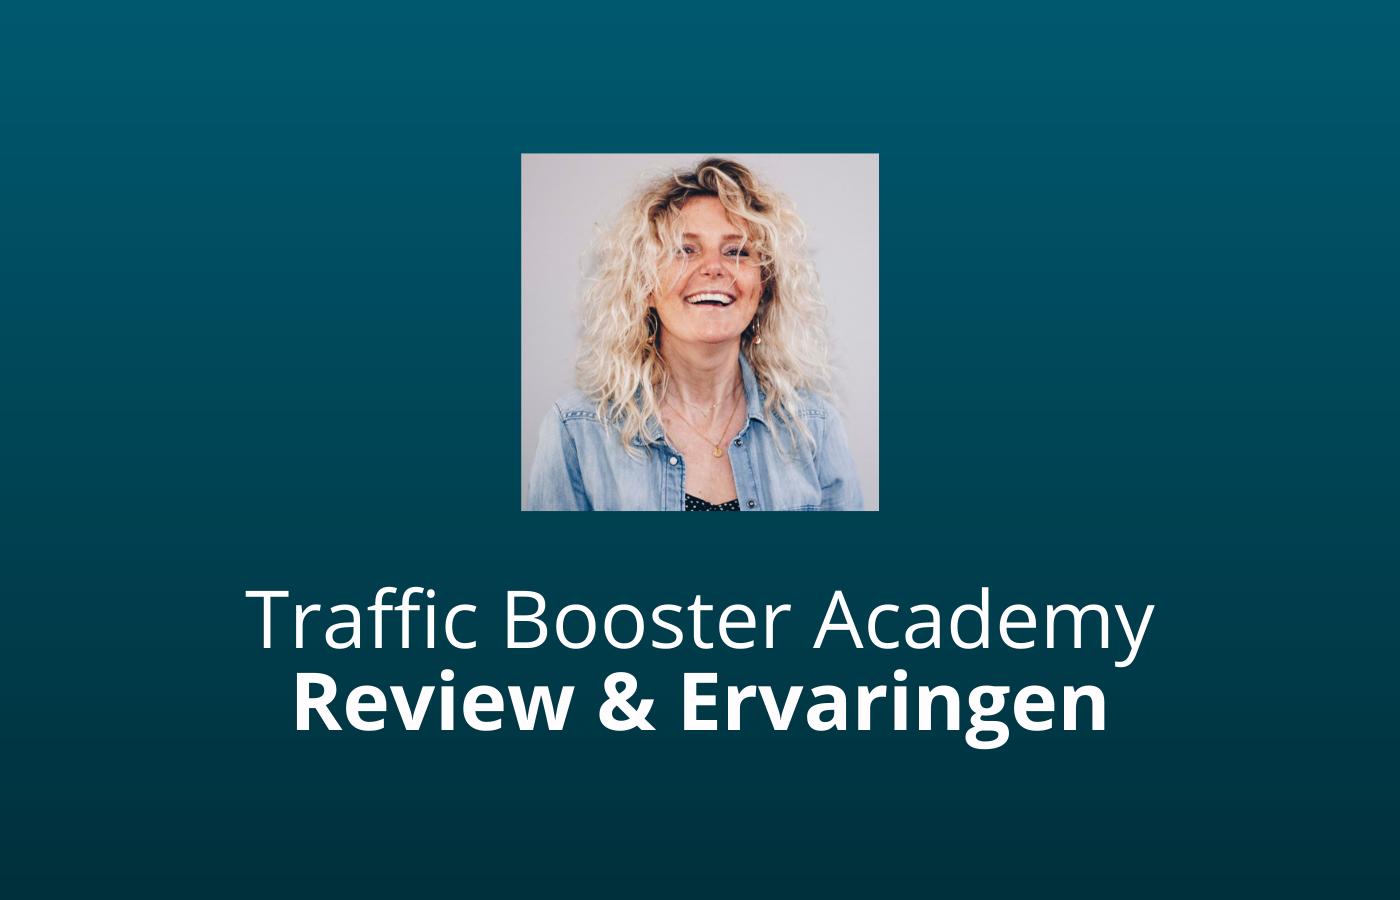 traffic booster academy review en ervaringen